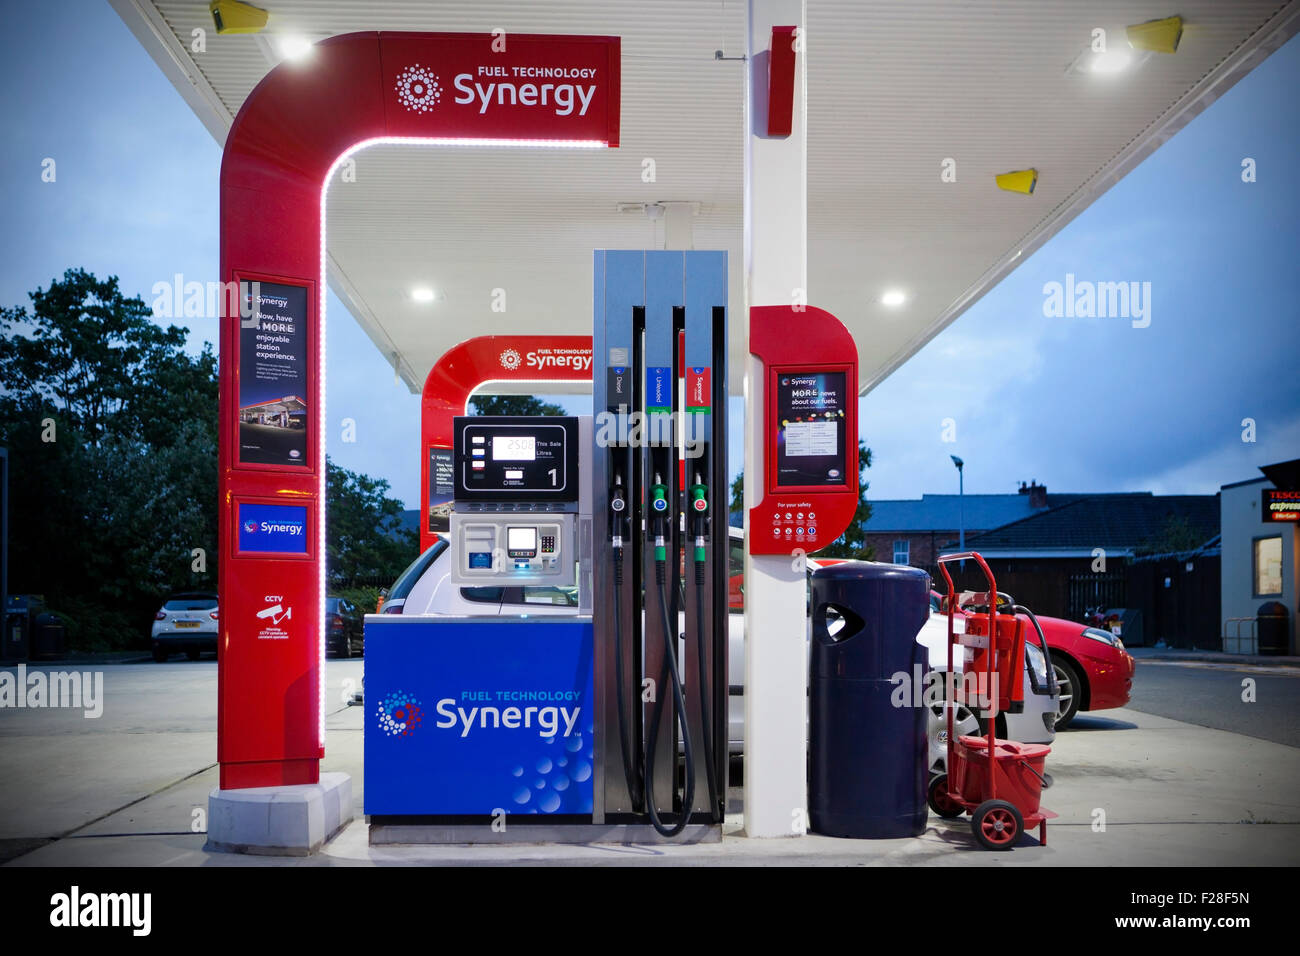 Nueva sinergia moderna Exxon Mobil bombas de gasolina en Pilling Lancashire, UK Imagen De Stock